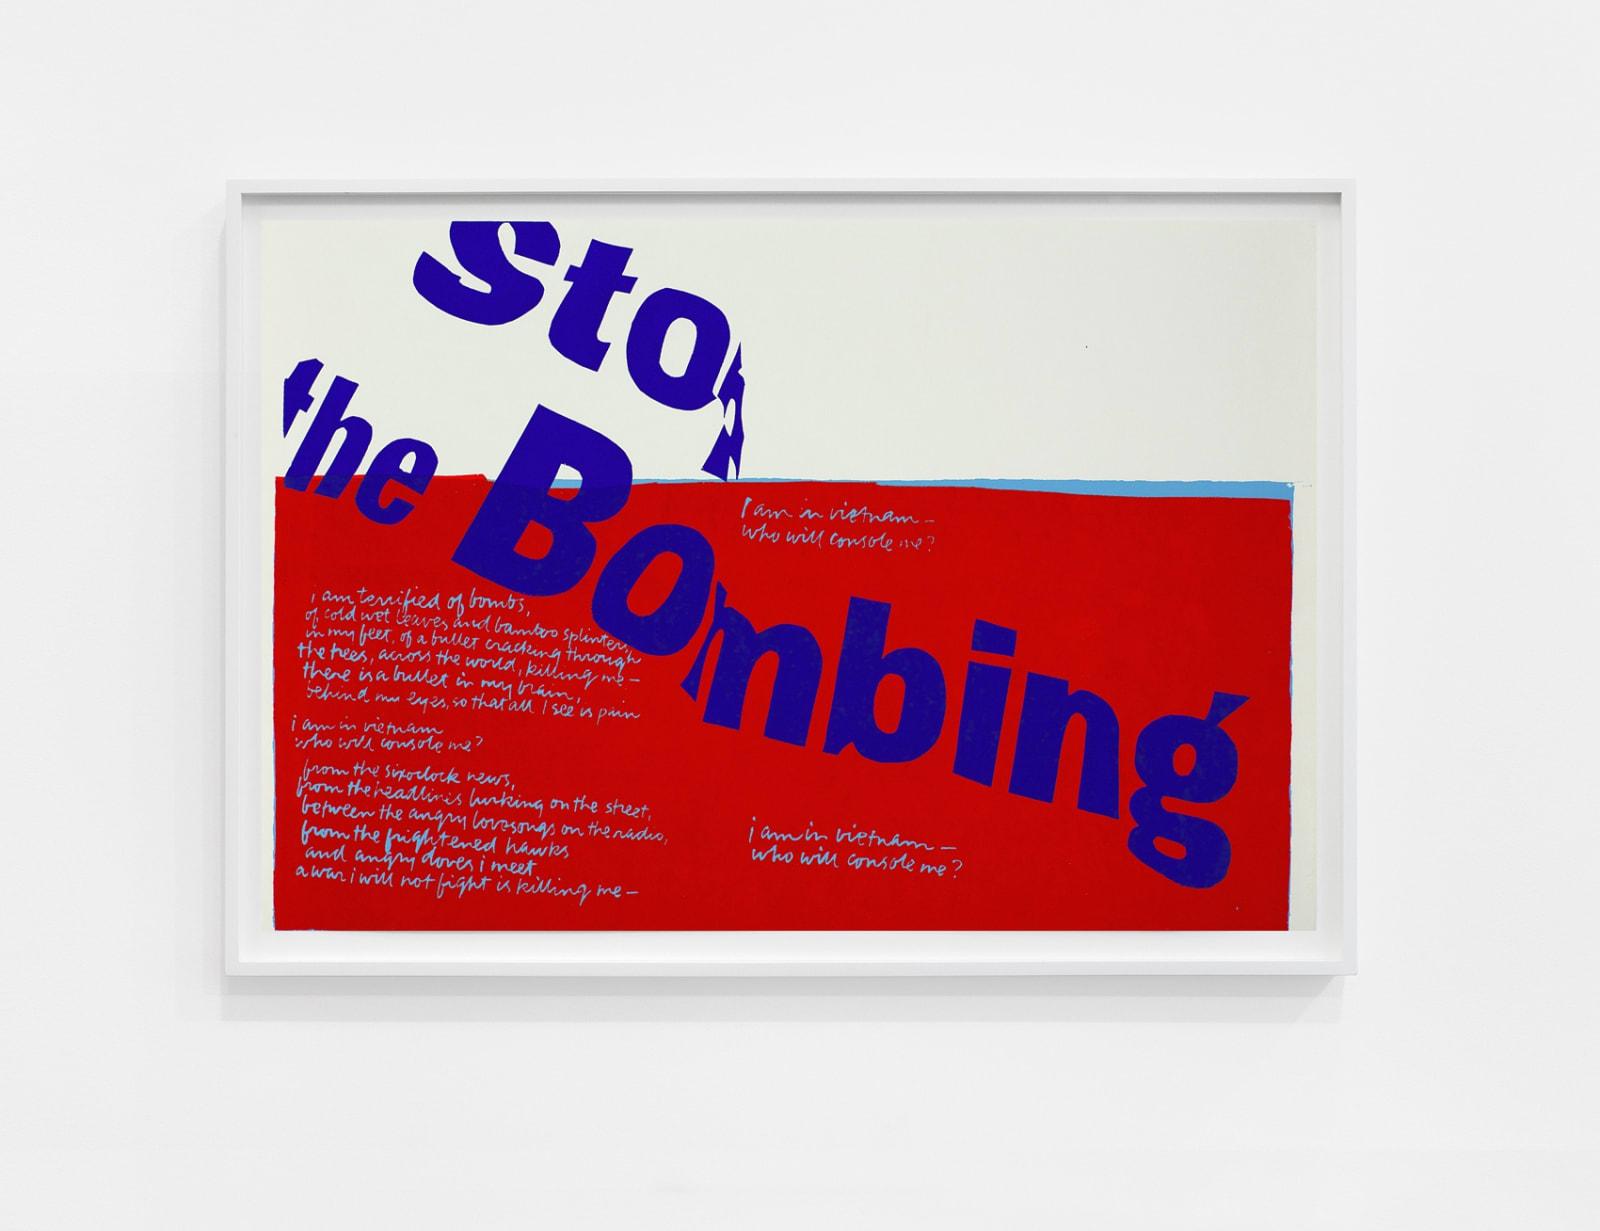 Corita Kent stop the bombing, 1967 Screenprint 15 3/4 x 23 in (40 x 58.4 cm) $7,000.00